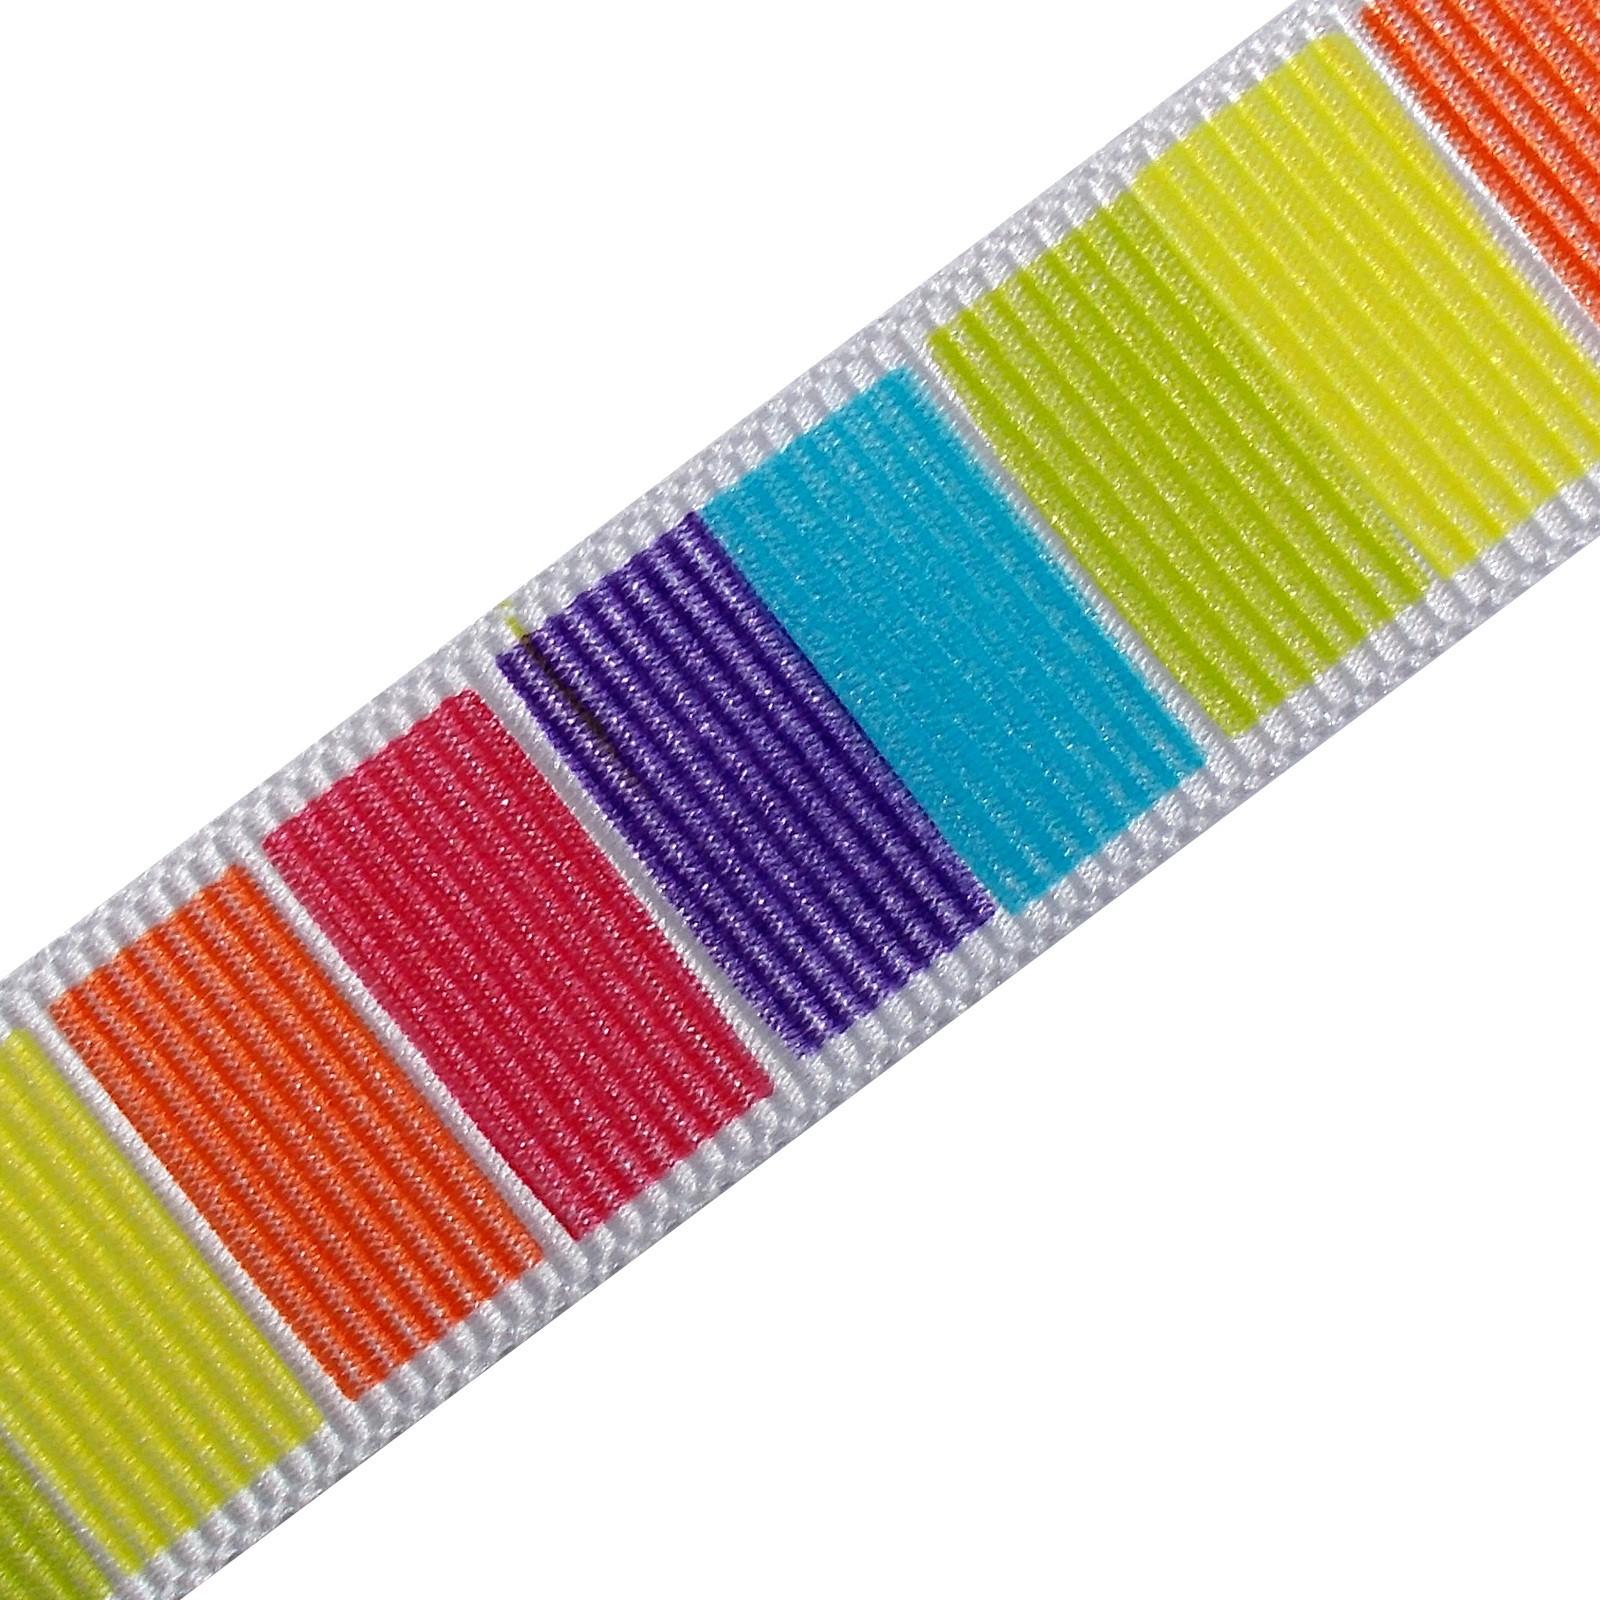 Berisfords Bright Rainbow Grosgrain Ribbon 25mm wide Block Stripes 3 metre length